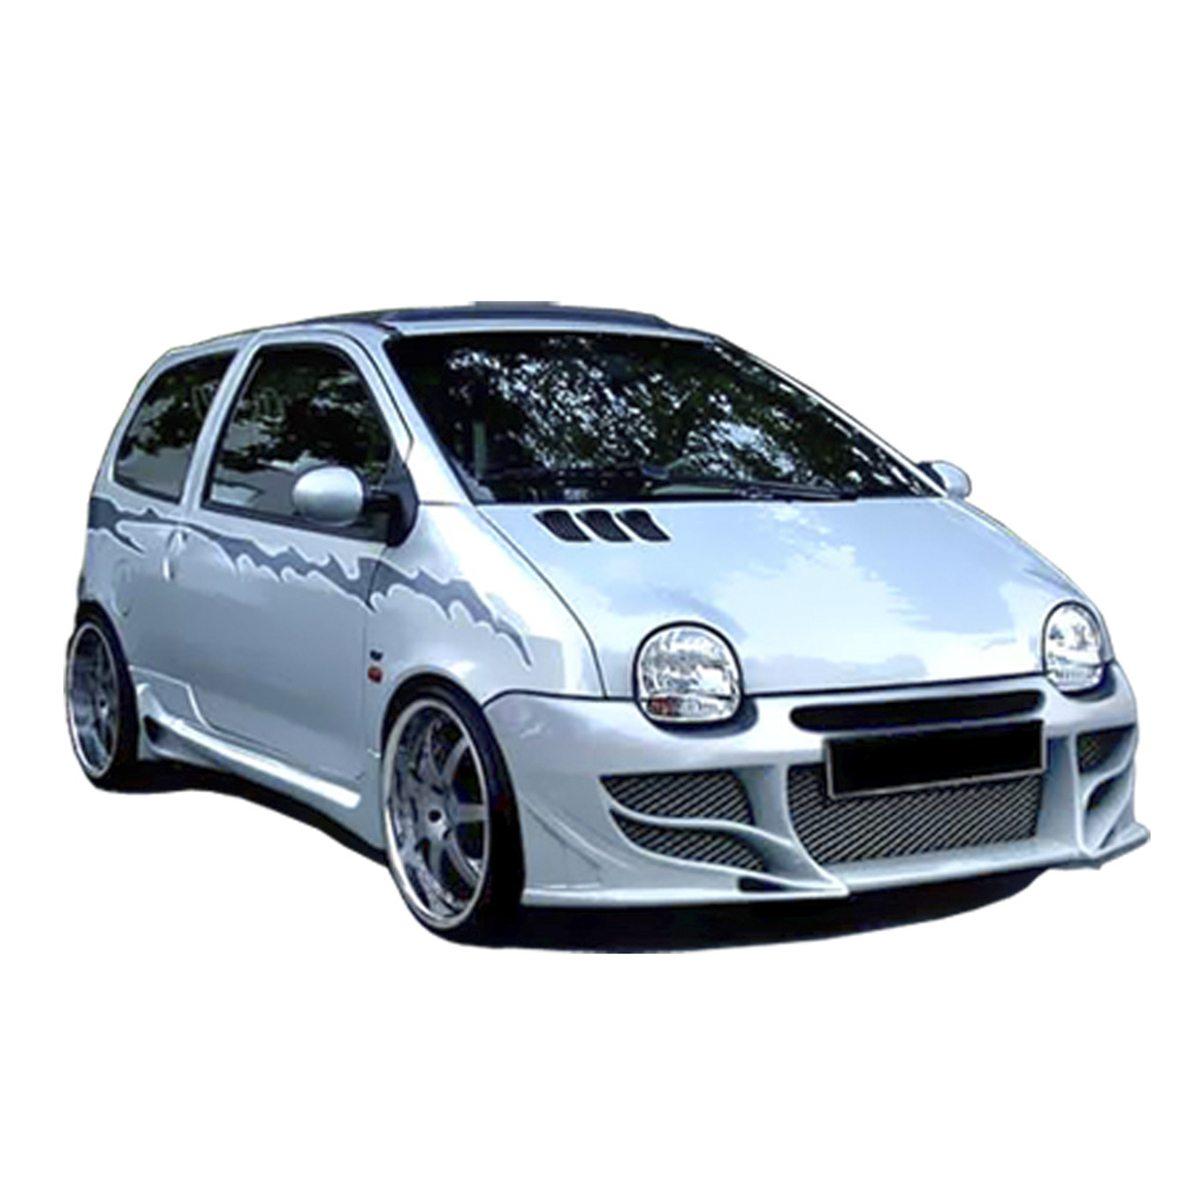 Renault-Twingo-LKA1-Frt-PCS188